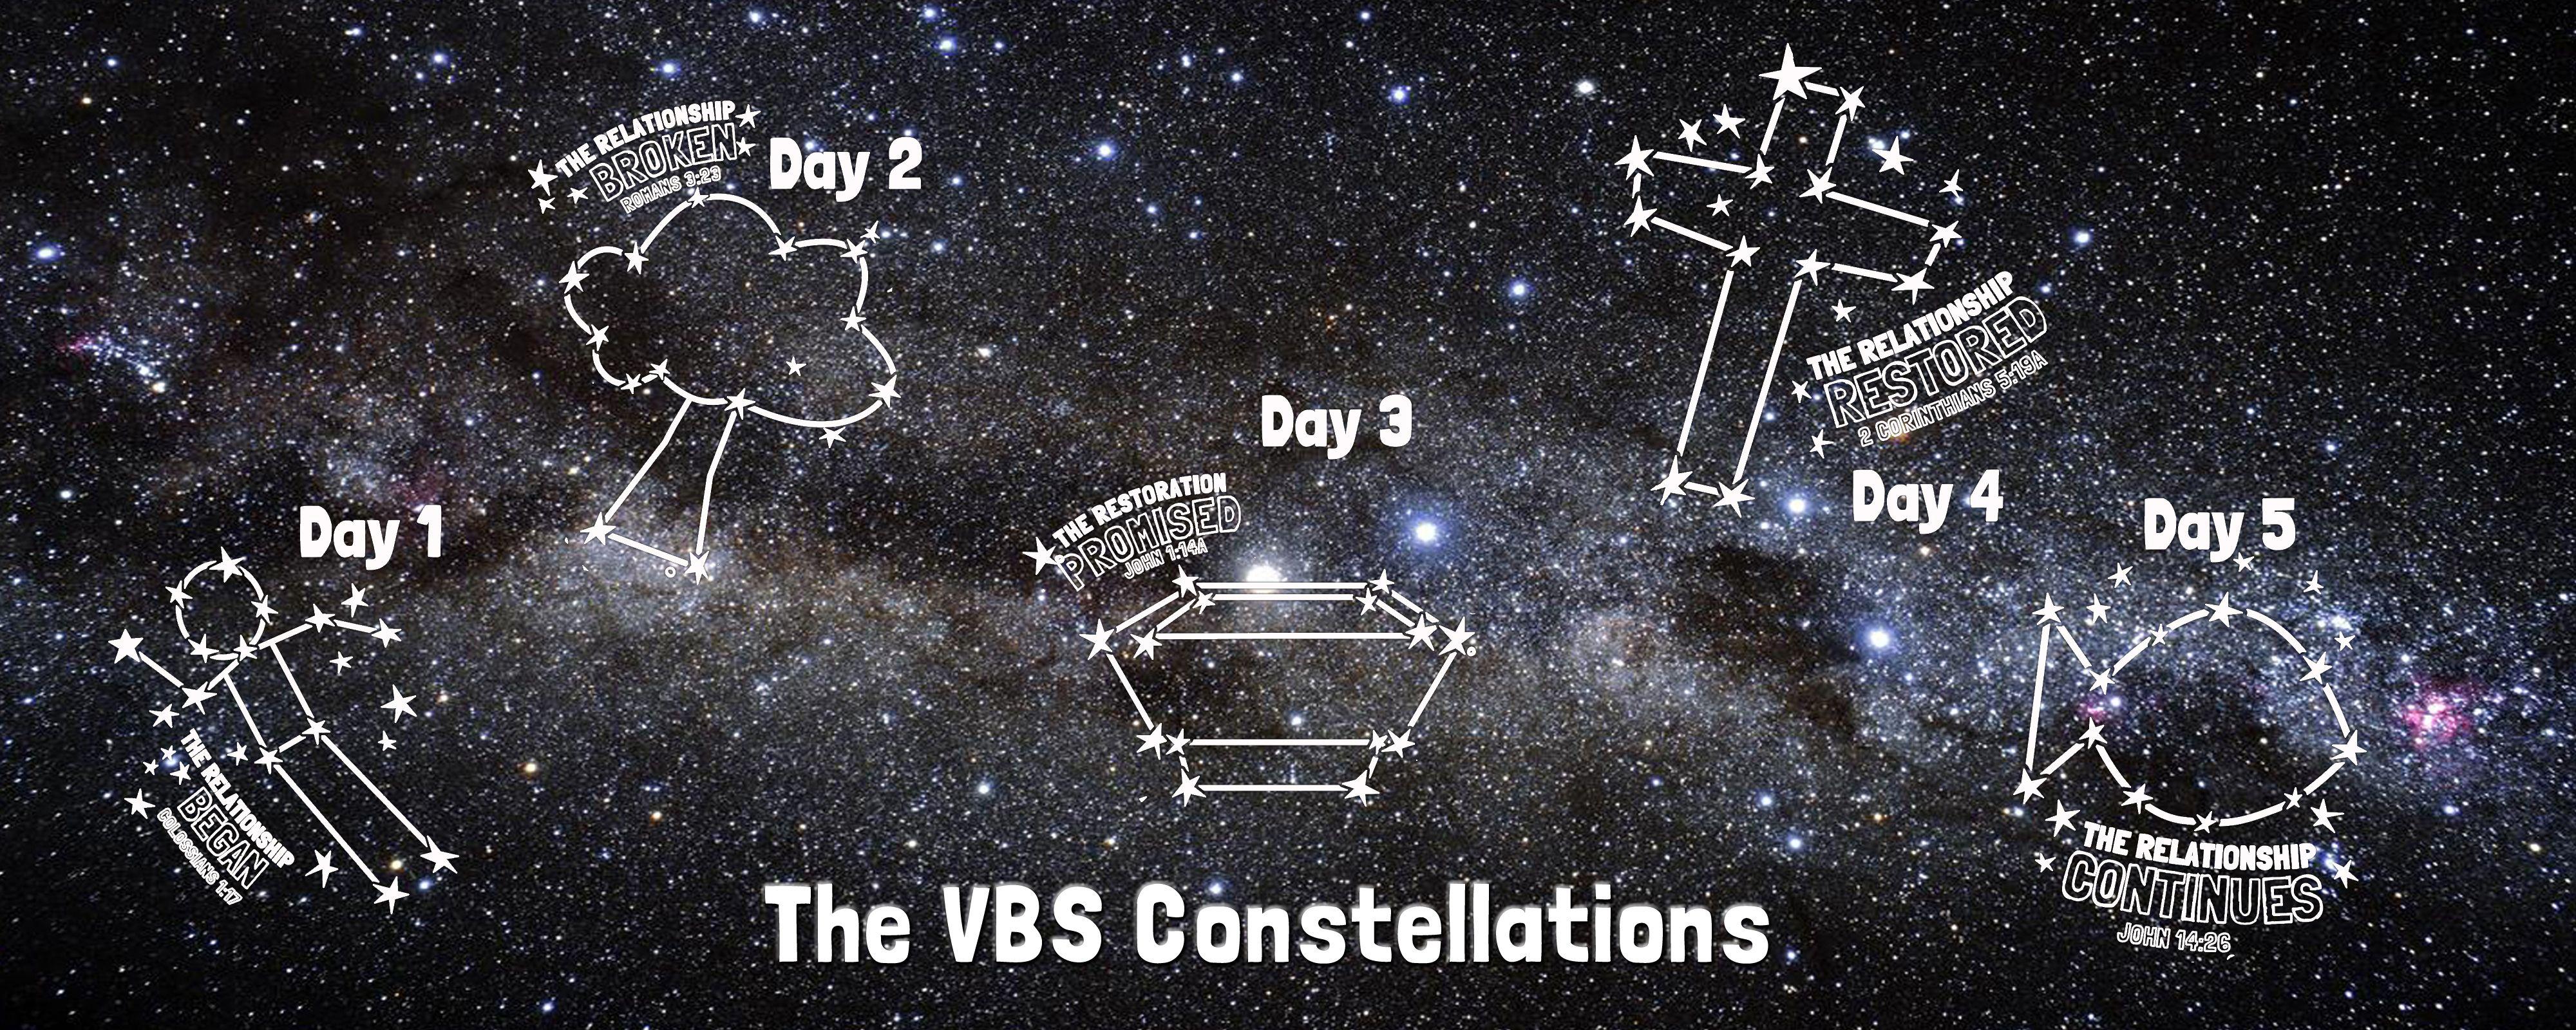 Vbs Constellations Galactic Starveyors Vbs 2017